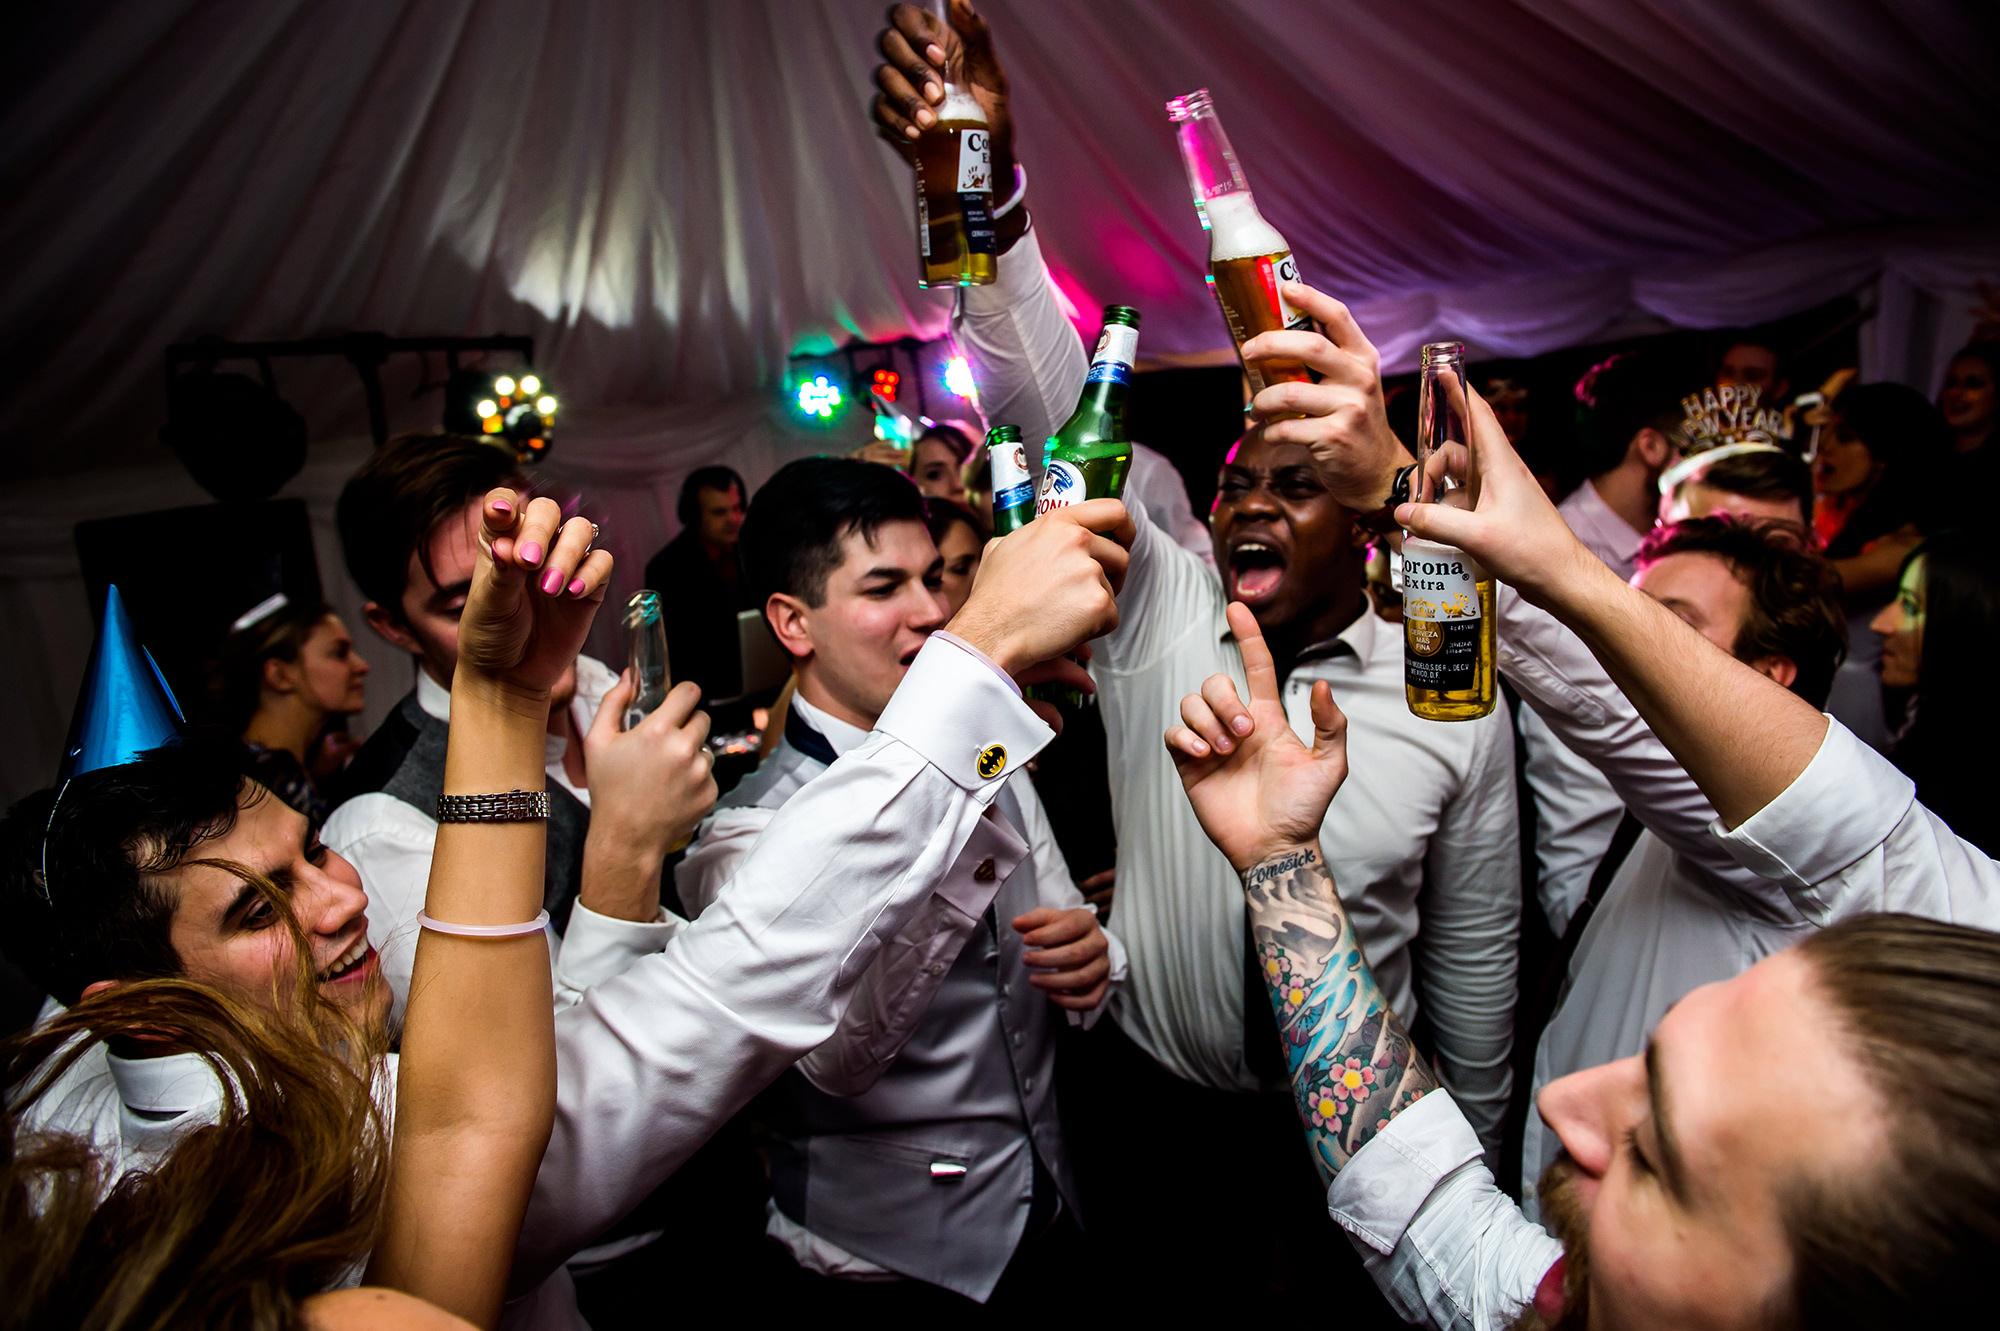 Simon biffen-best of 2015 wedding photographs-98